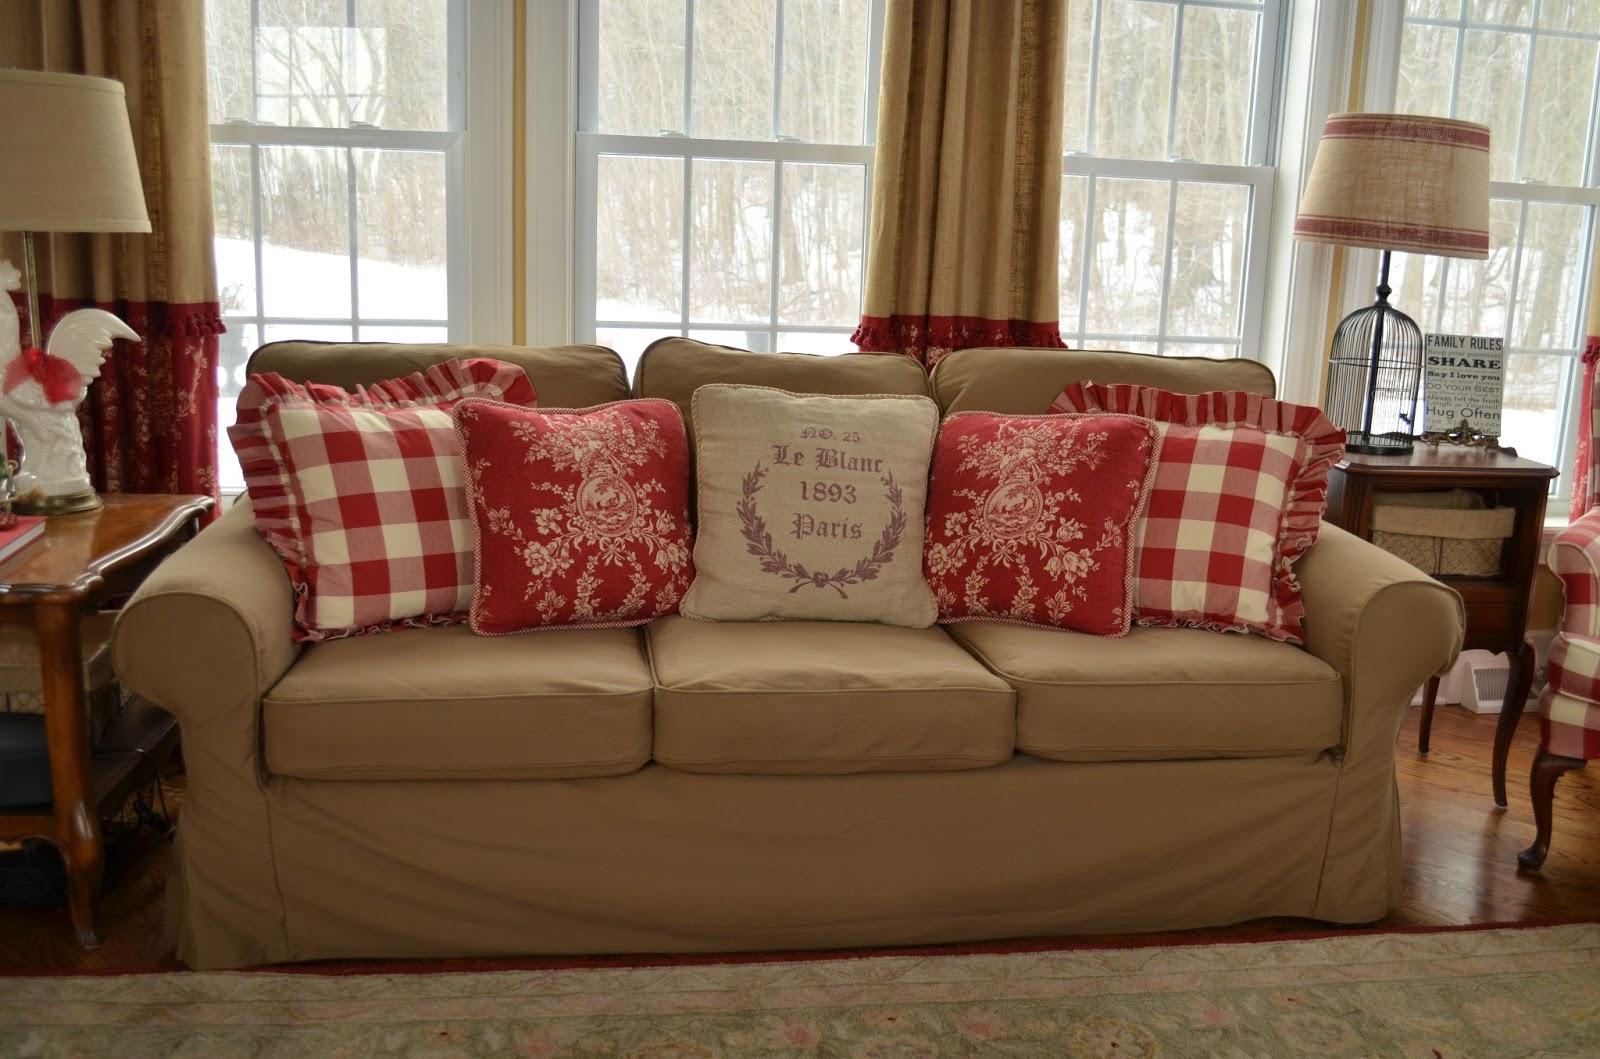 Buffalo Check Sofa Cover Bed Sheets Canada The Thrifty Gypsy Slipcover Secret